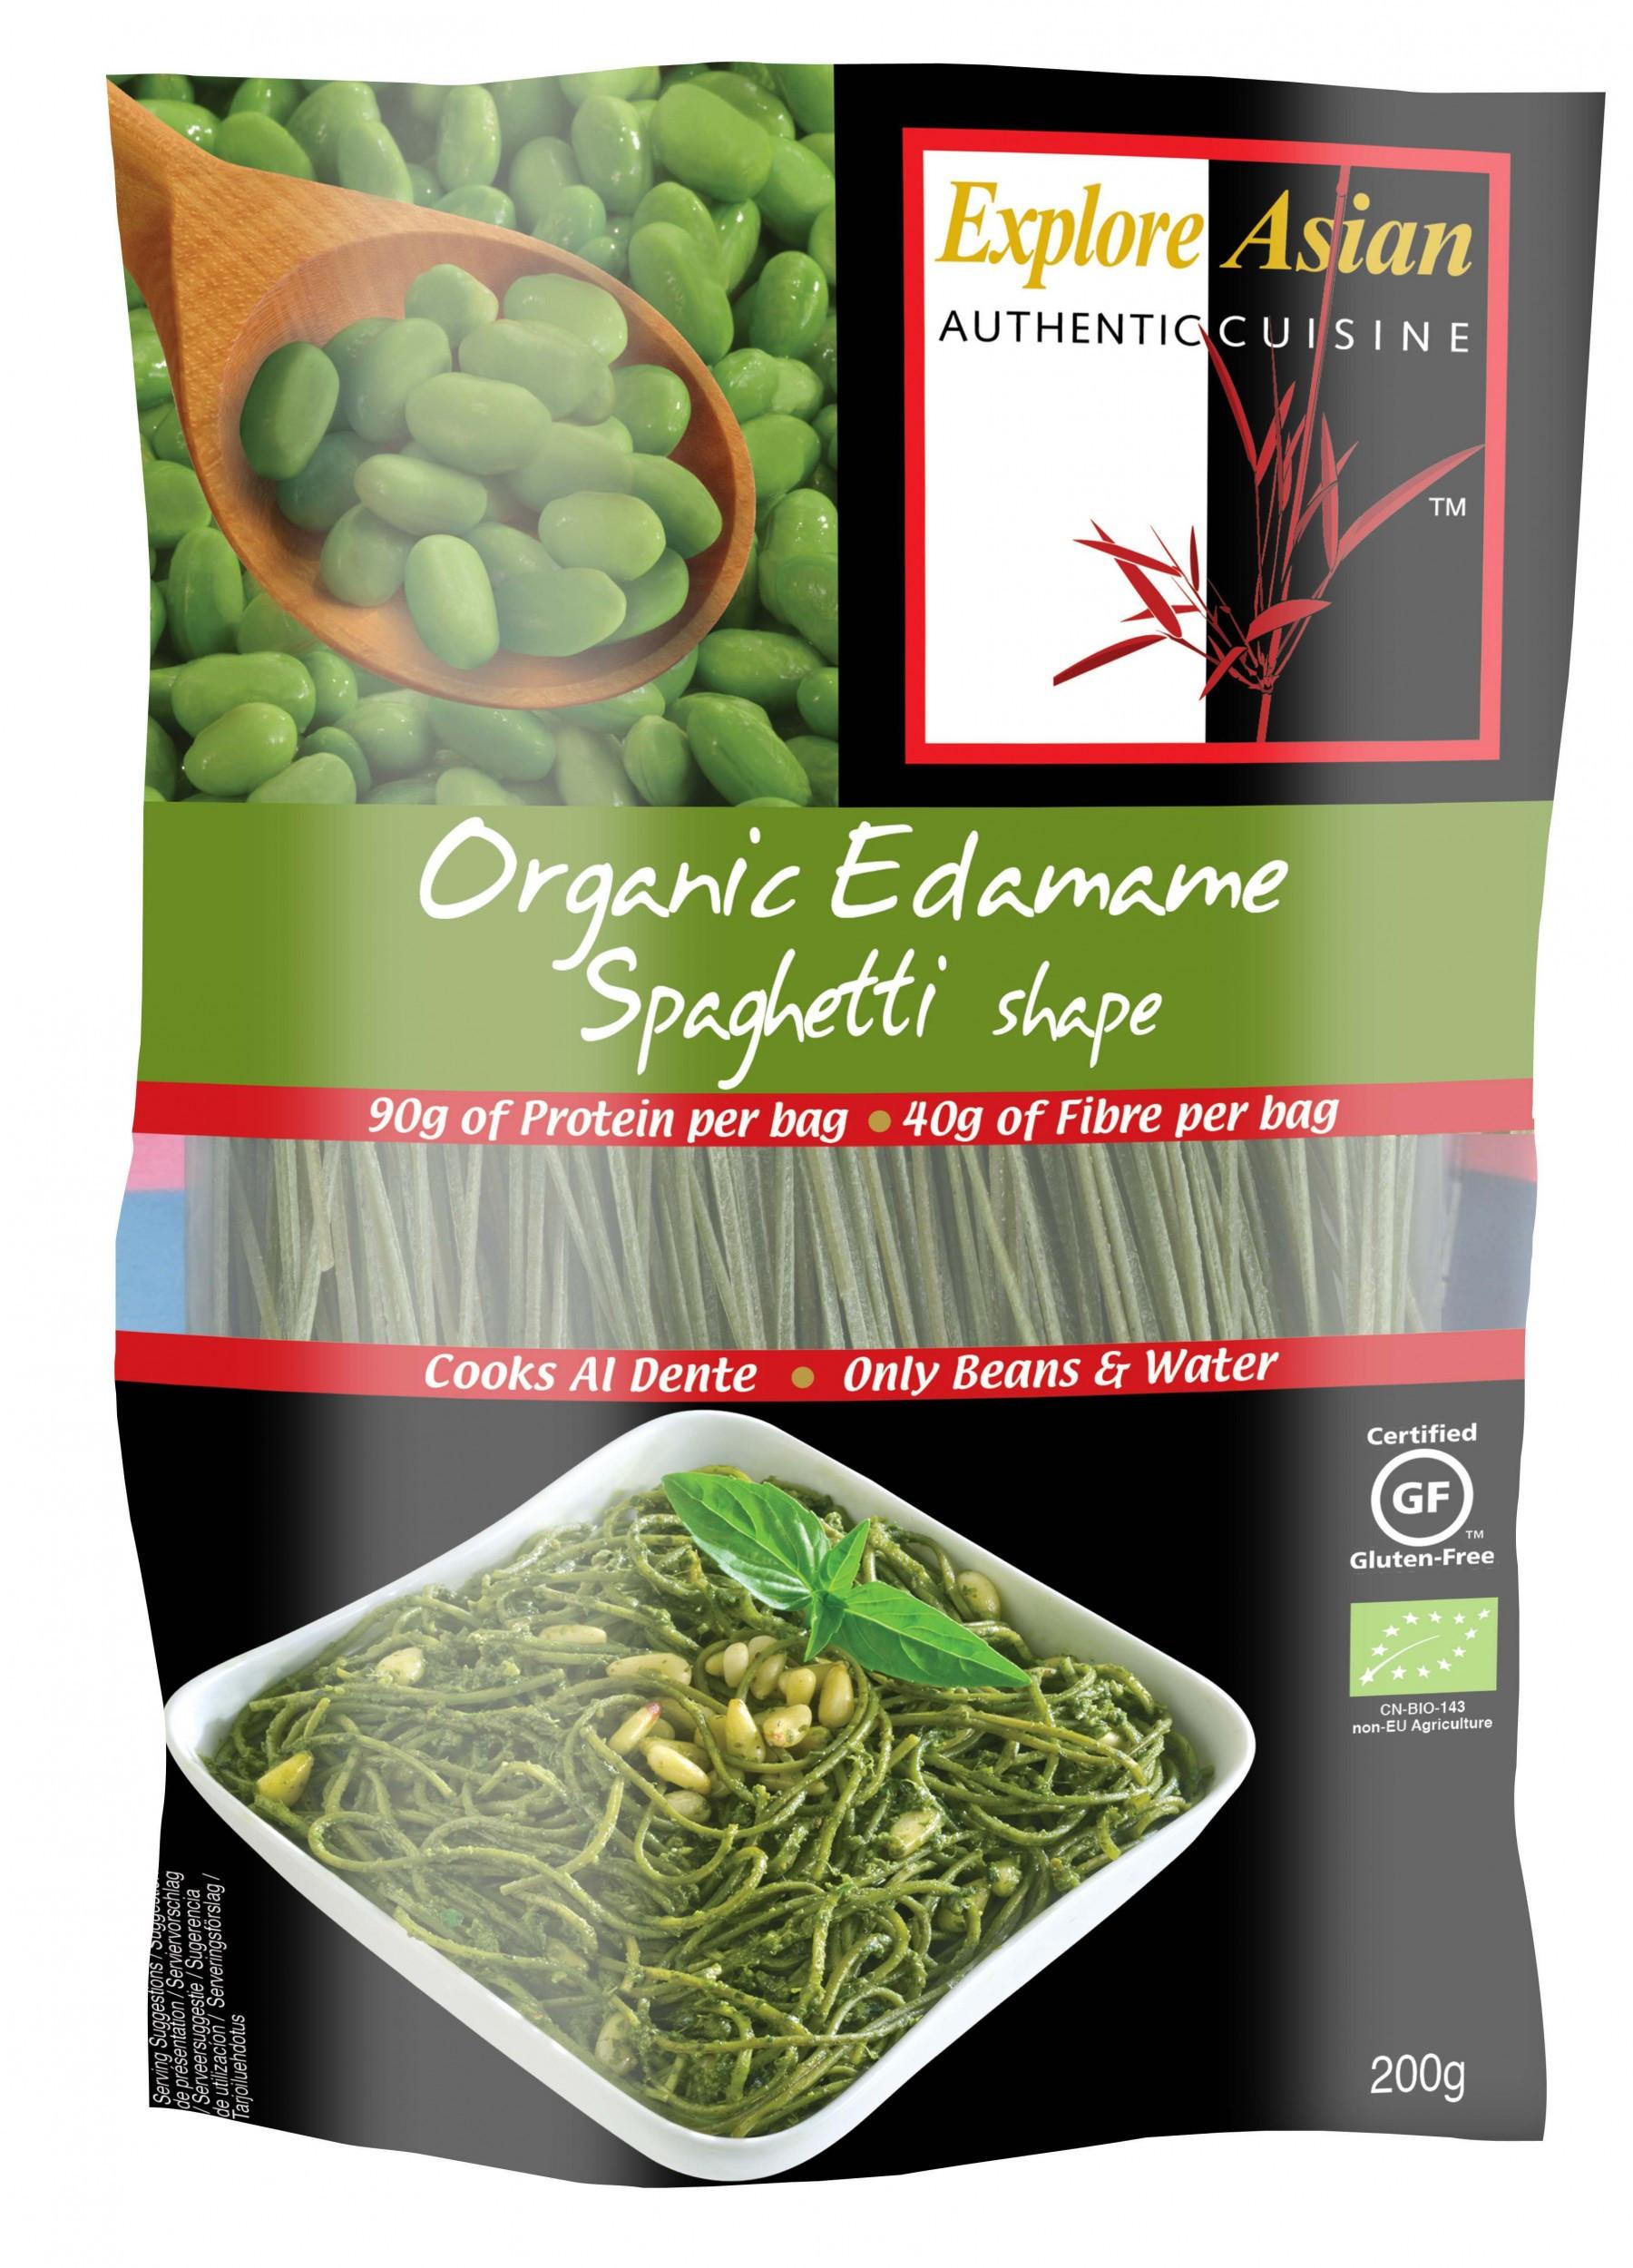 Explore Asian Organic Edamame Spaghetti  Explore Asian Organic Edamame Spaghetti 200g